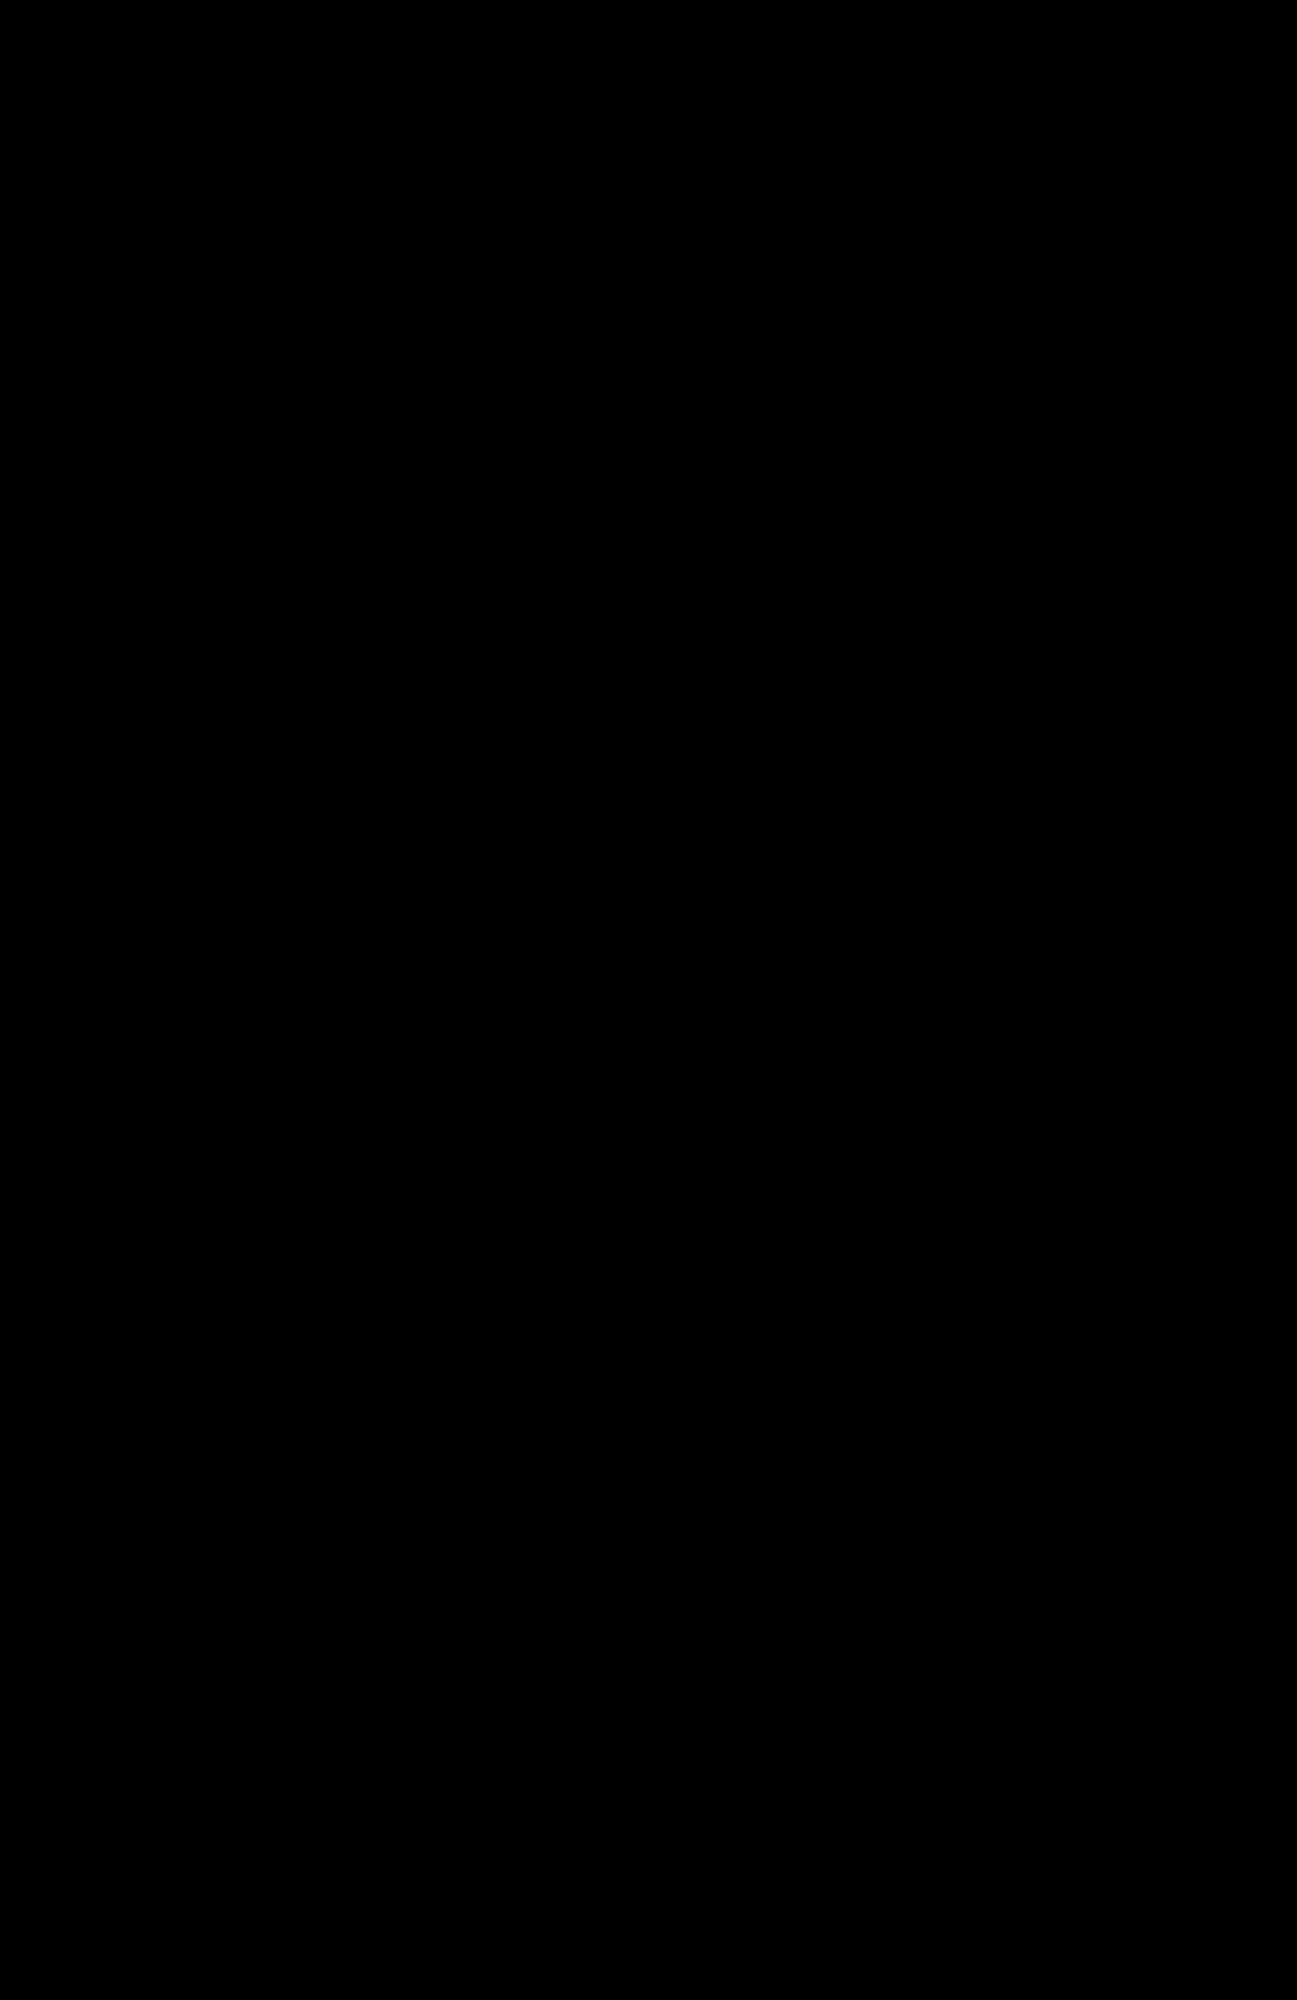 train-logo-black.png